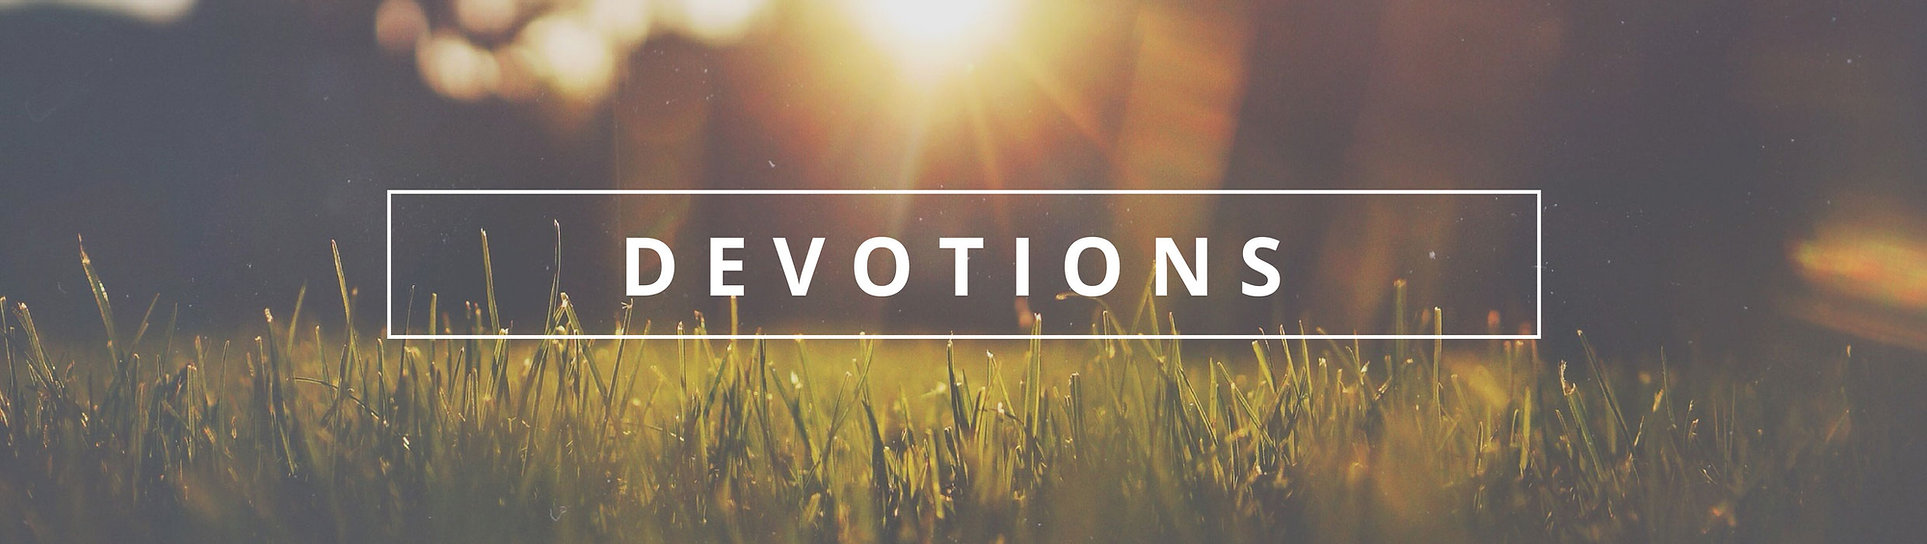 daily-devotion-header.jpg